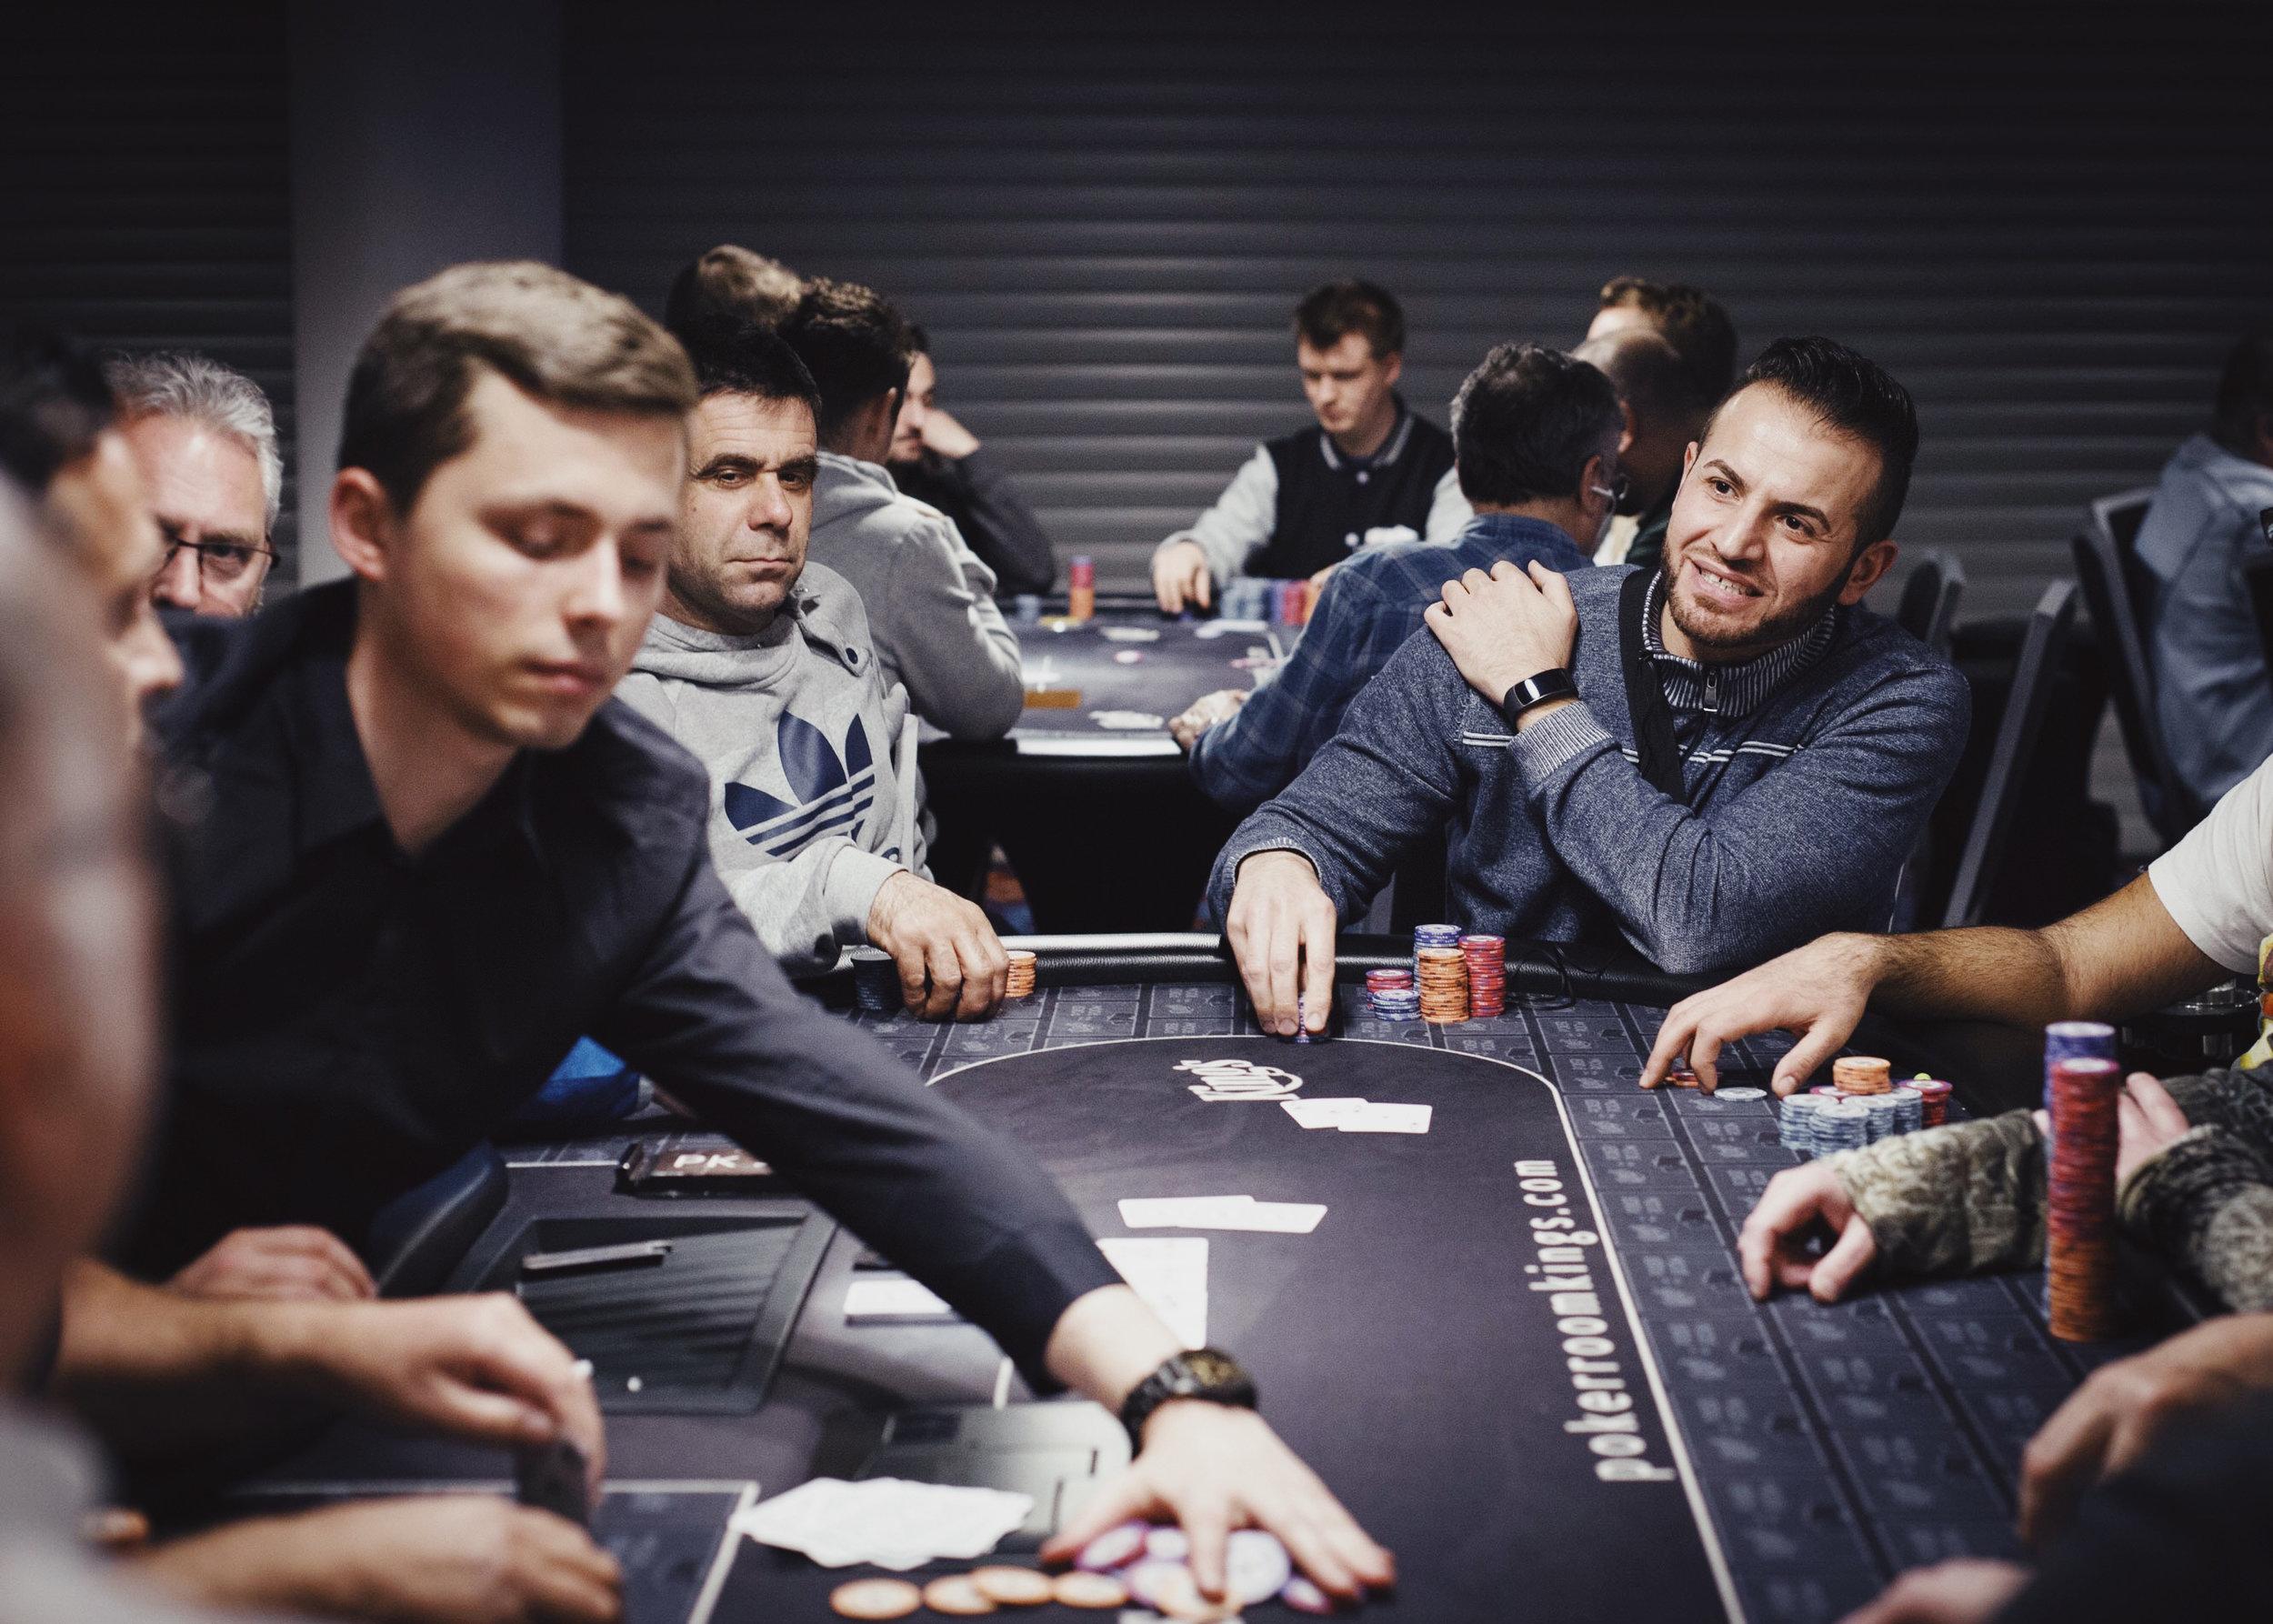 polina-shubkina-poker-014.JPG